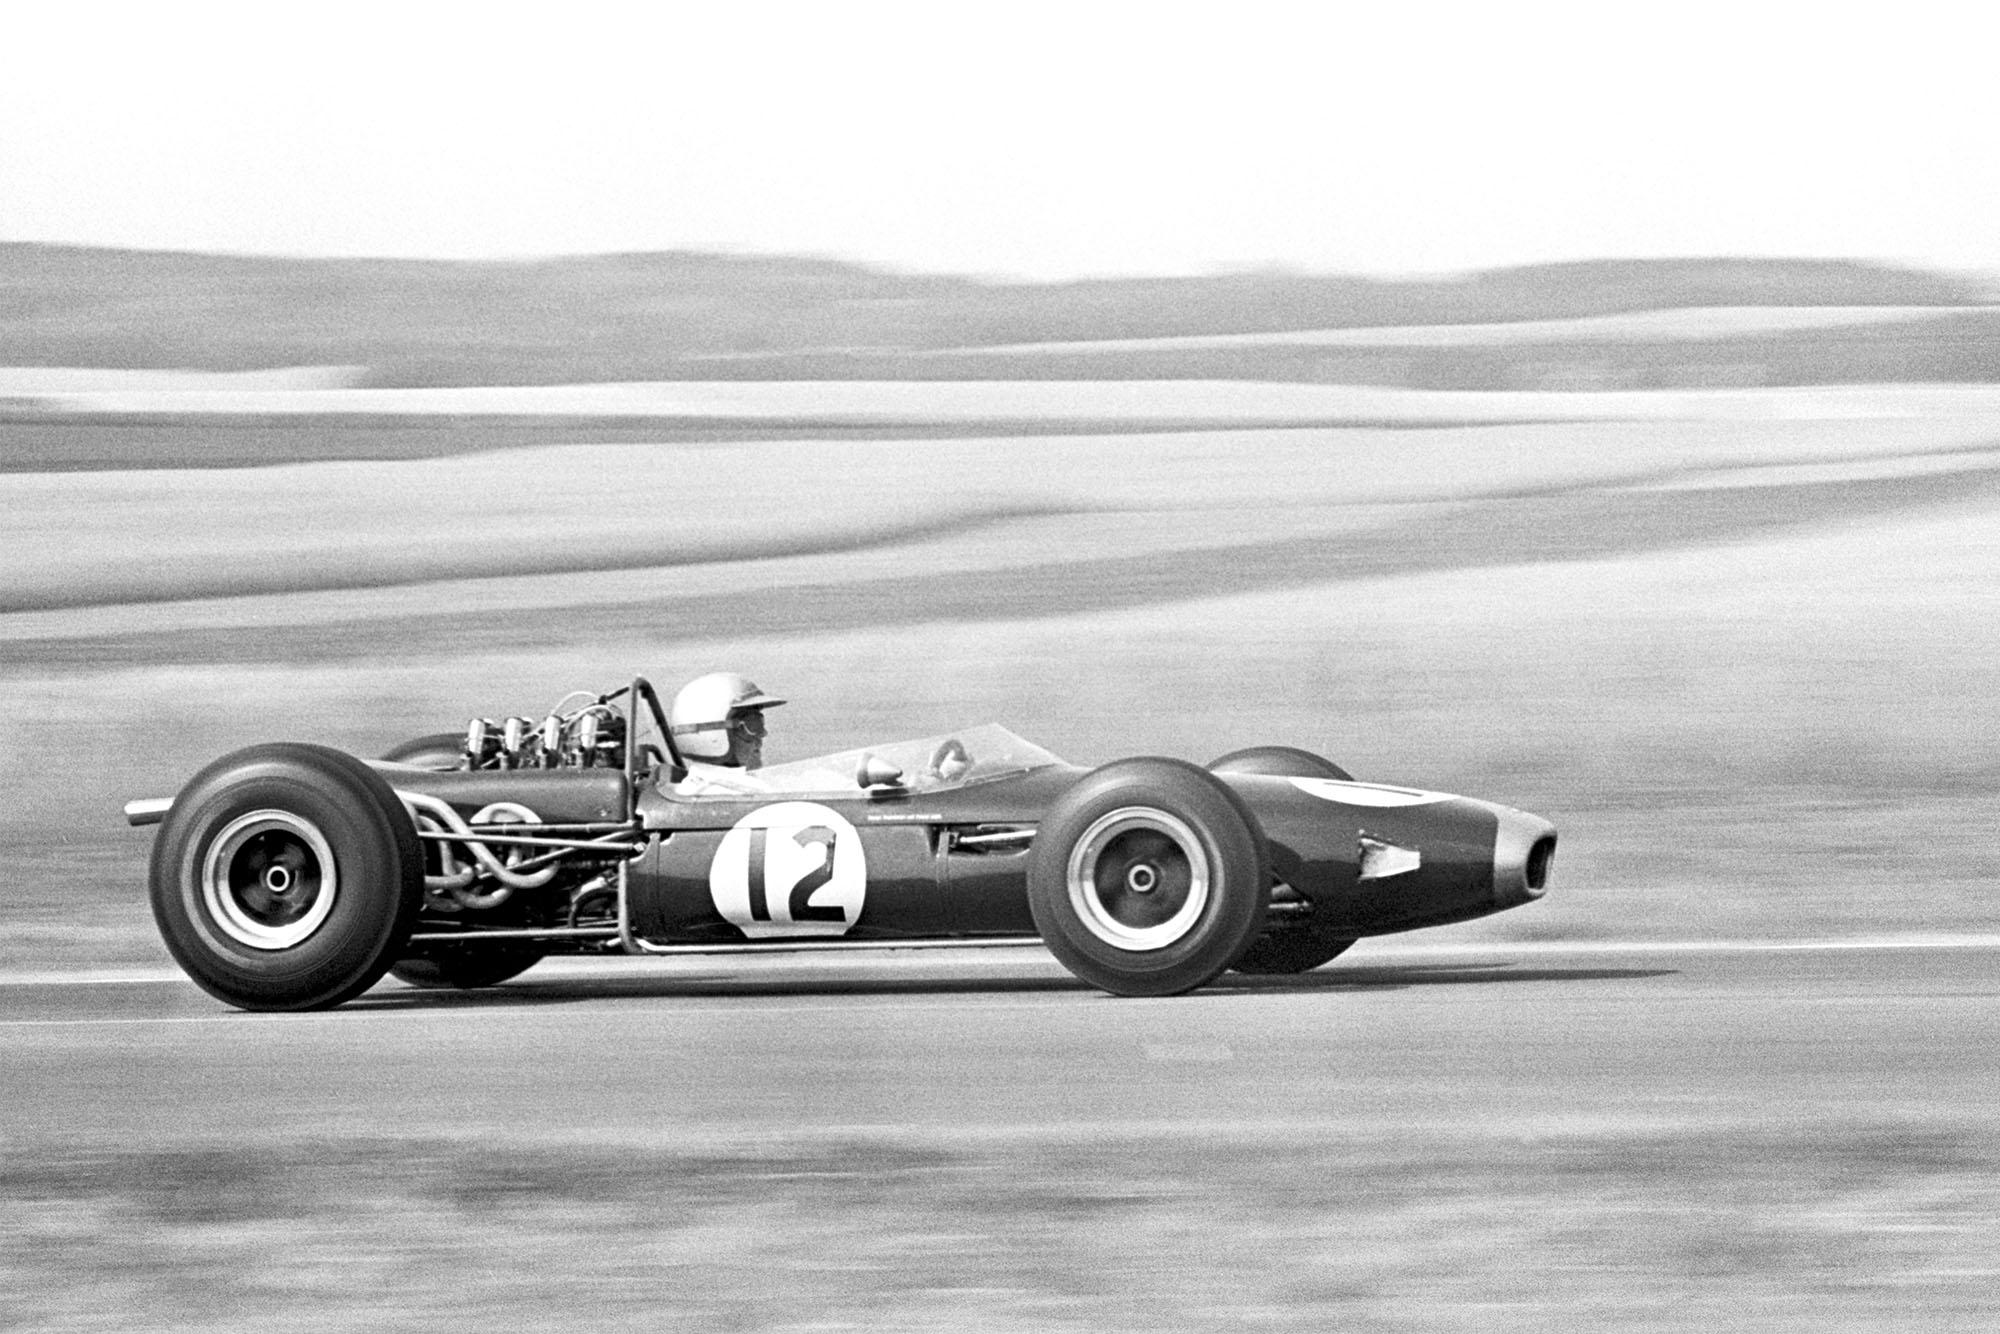 1966 French GP Brabham 3